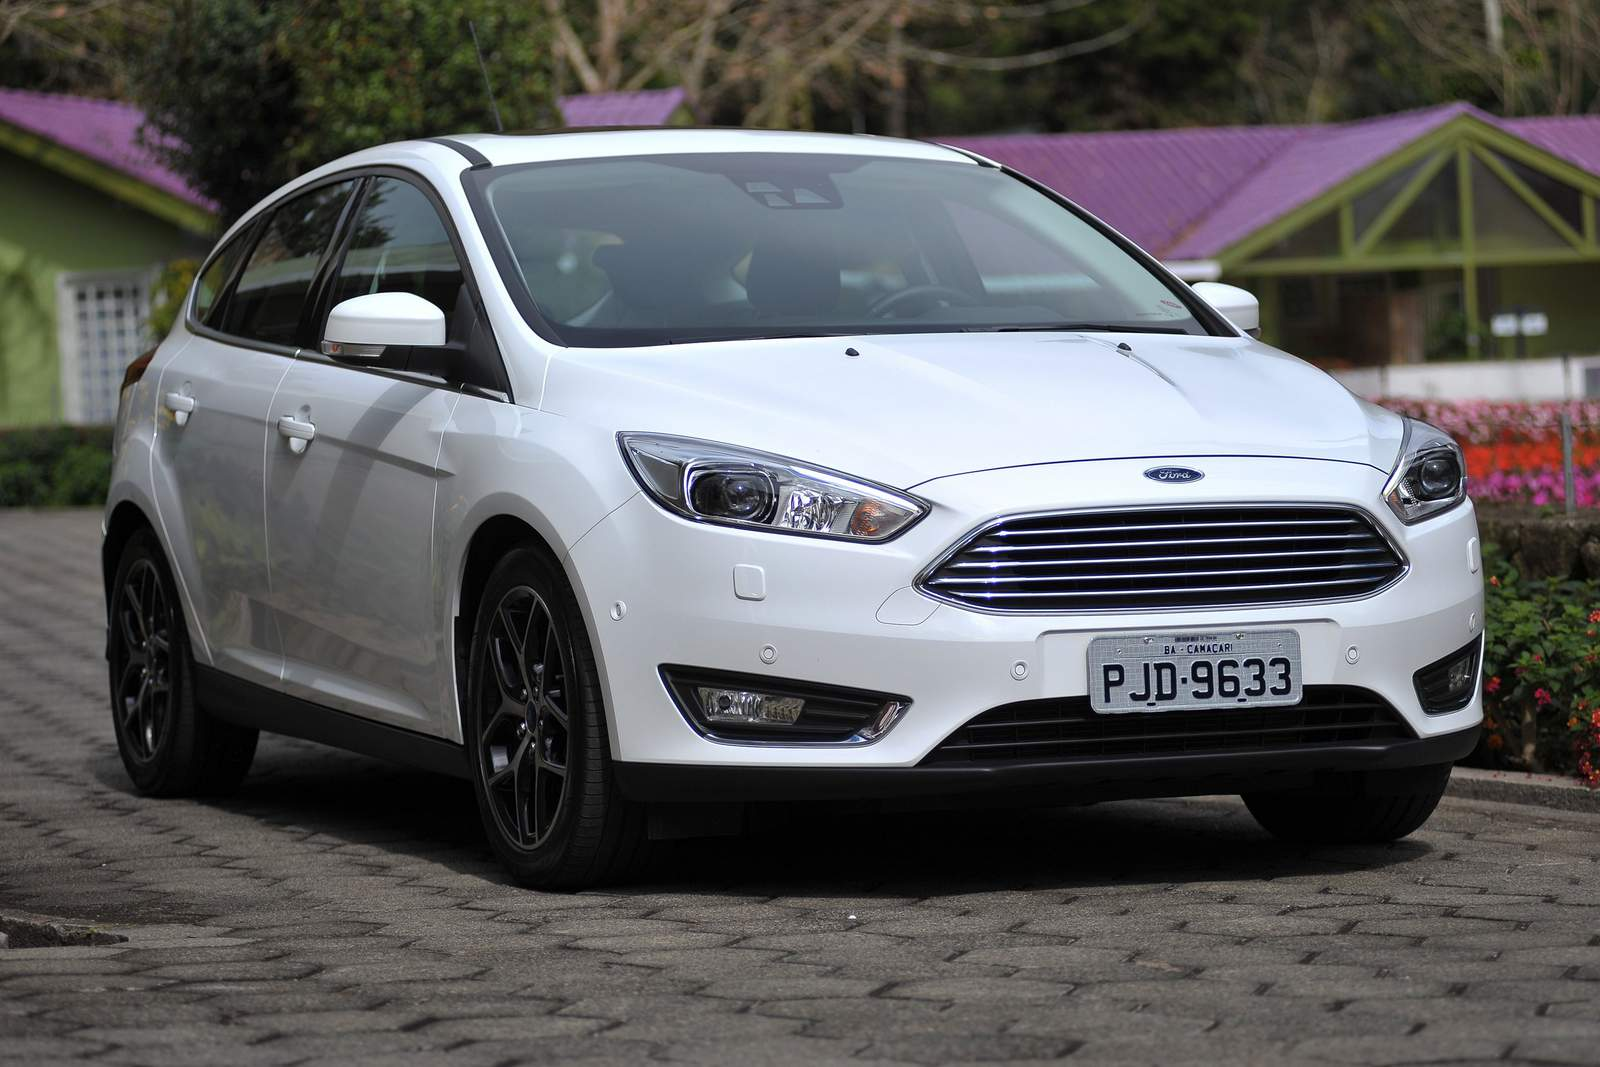 Ford focus hatch 2016